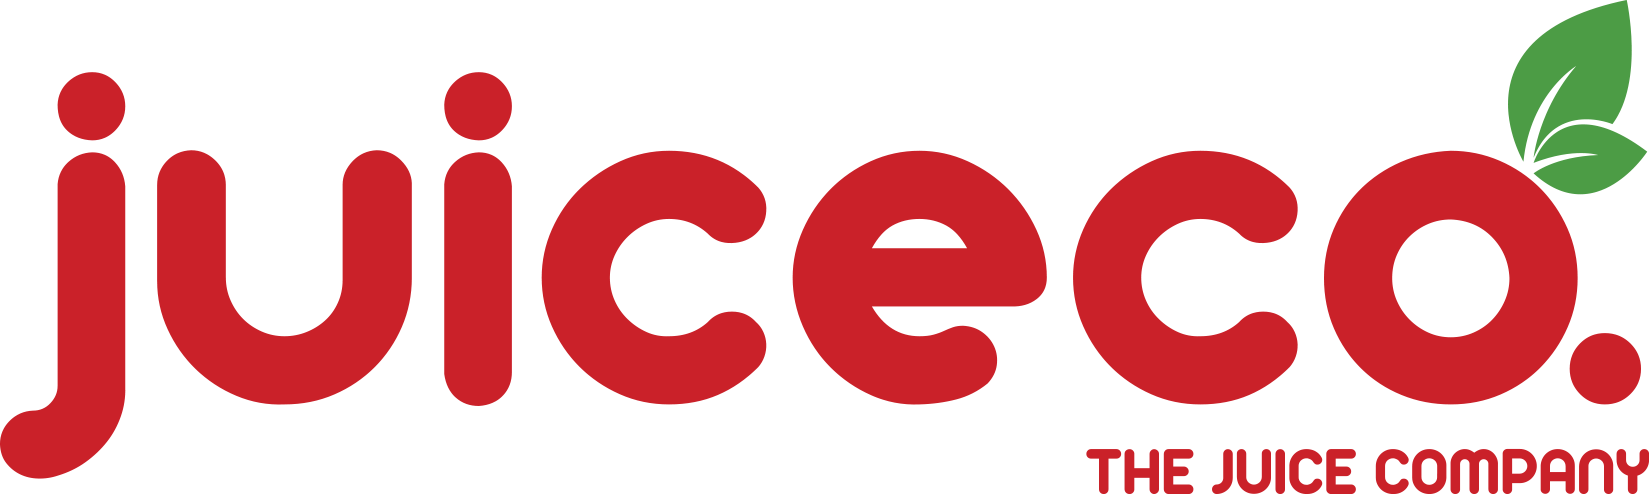 juiceco Malaysa logo